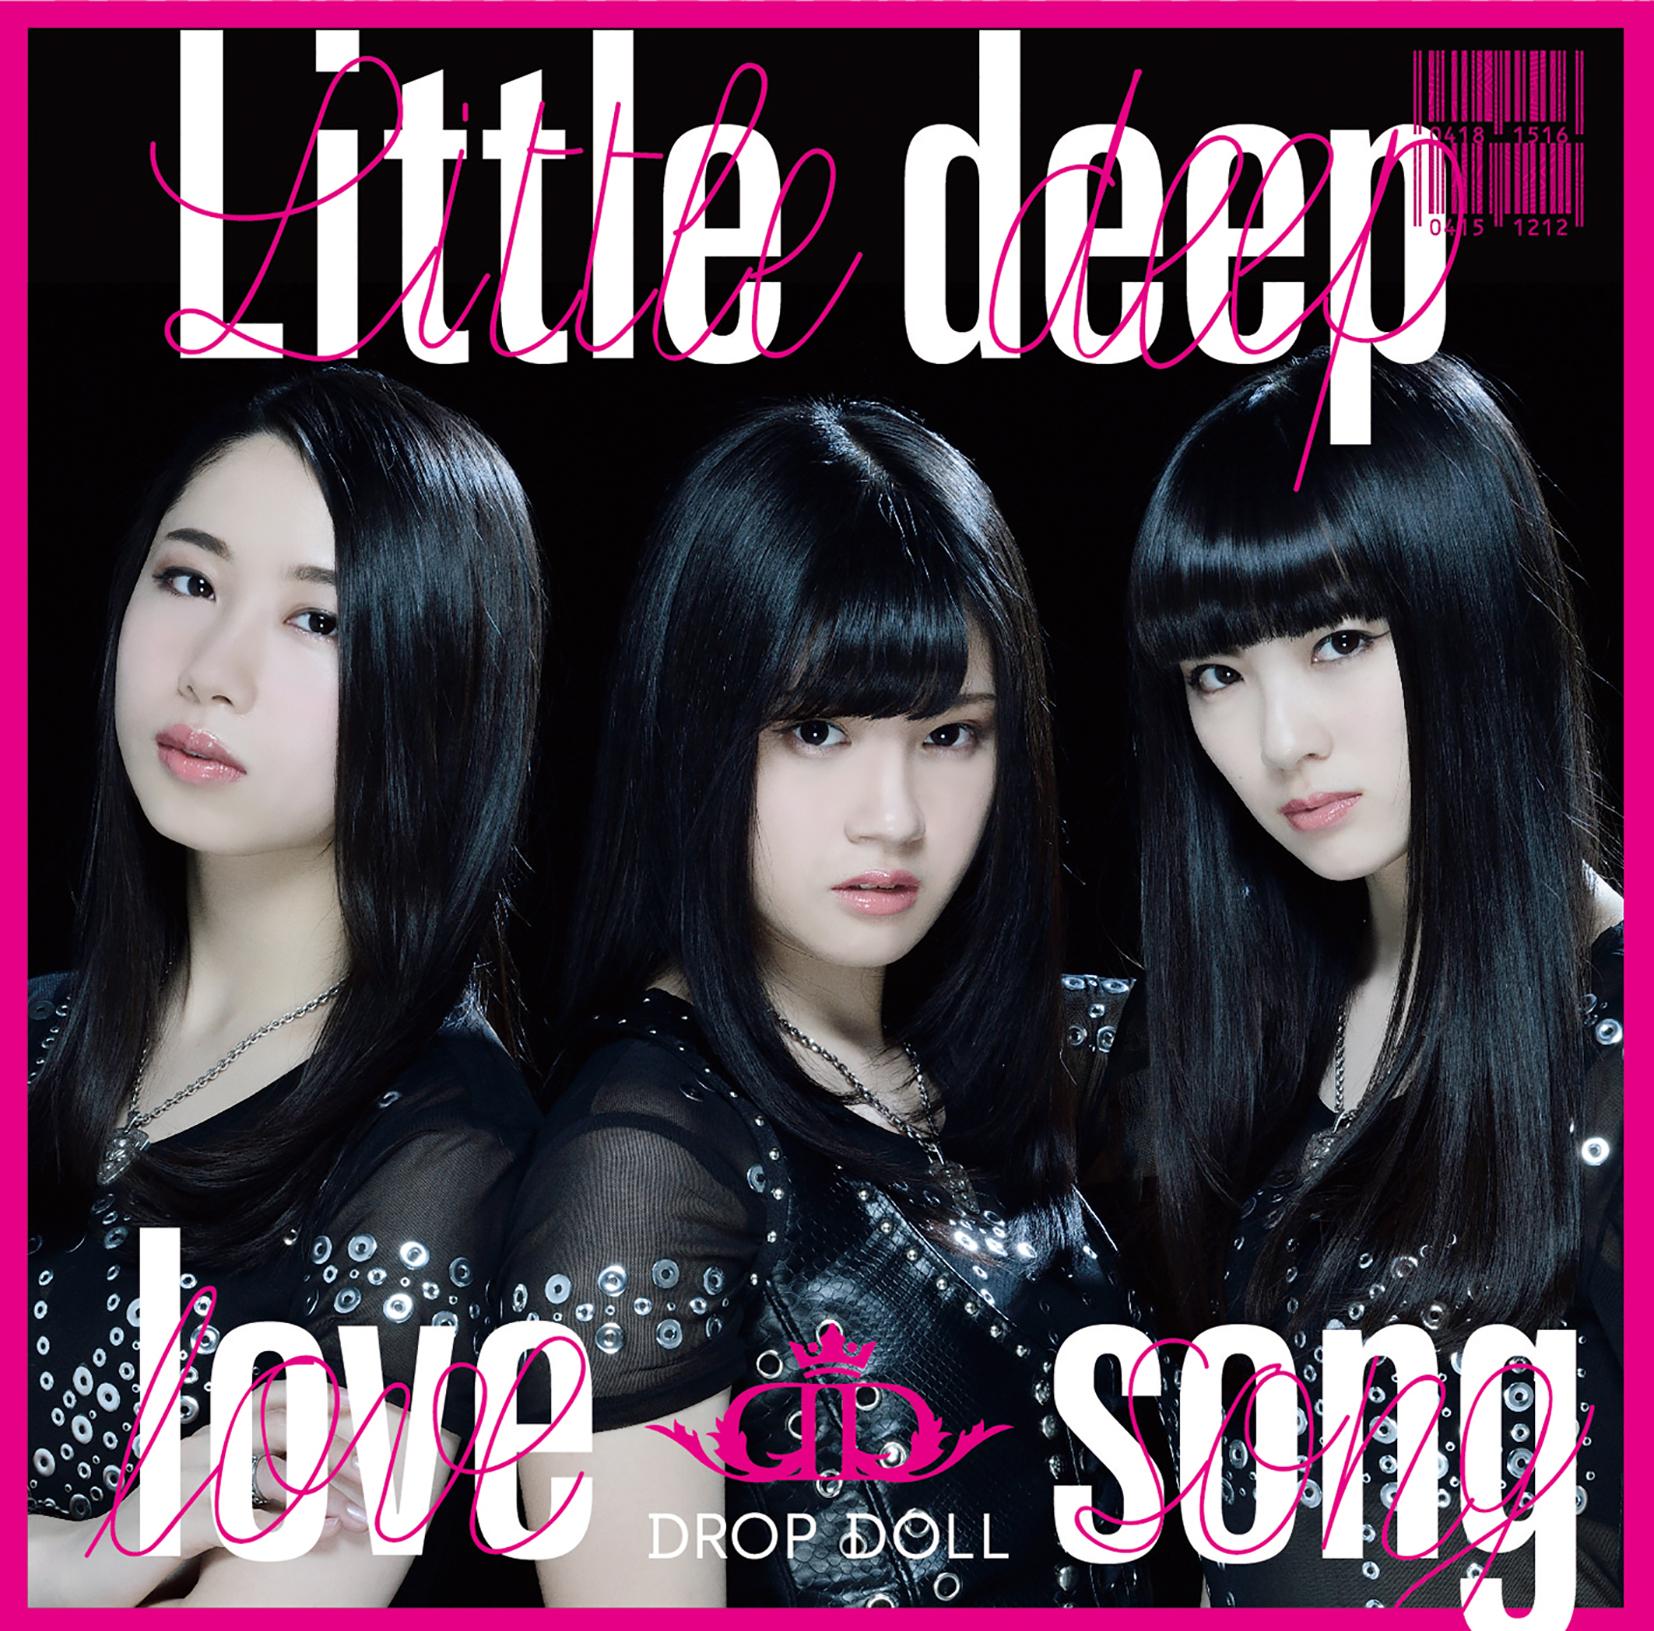 20180607.1200.01 Drop Doll - Little deep love song (FLAC) cover 1.jpg